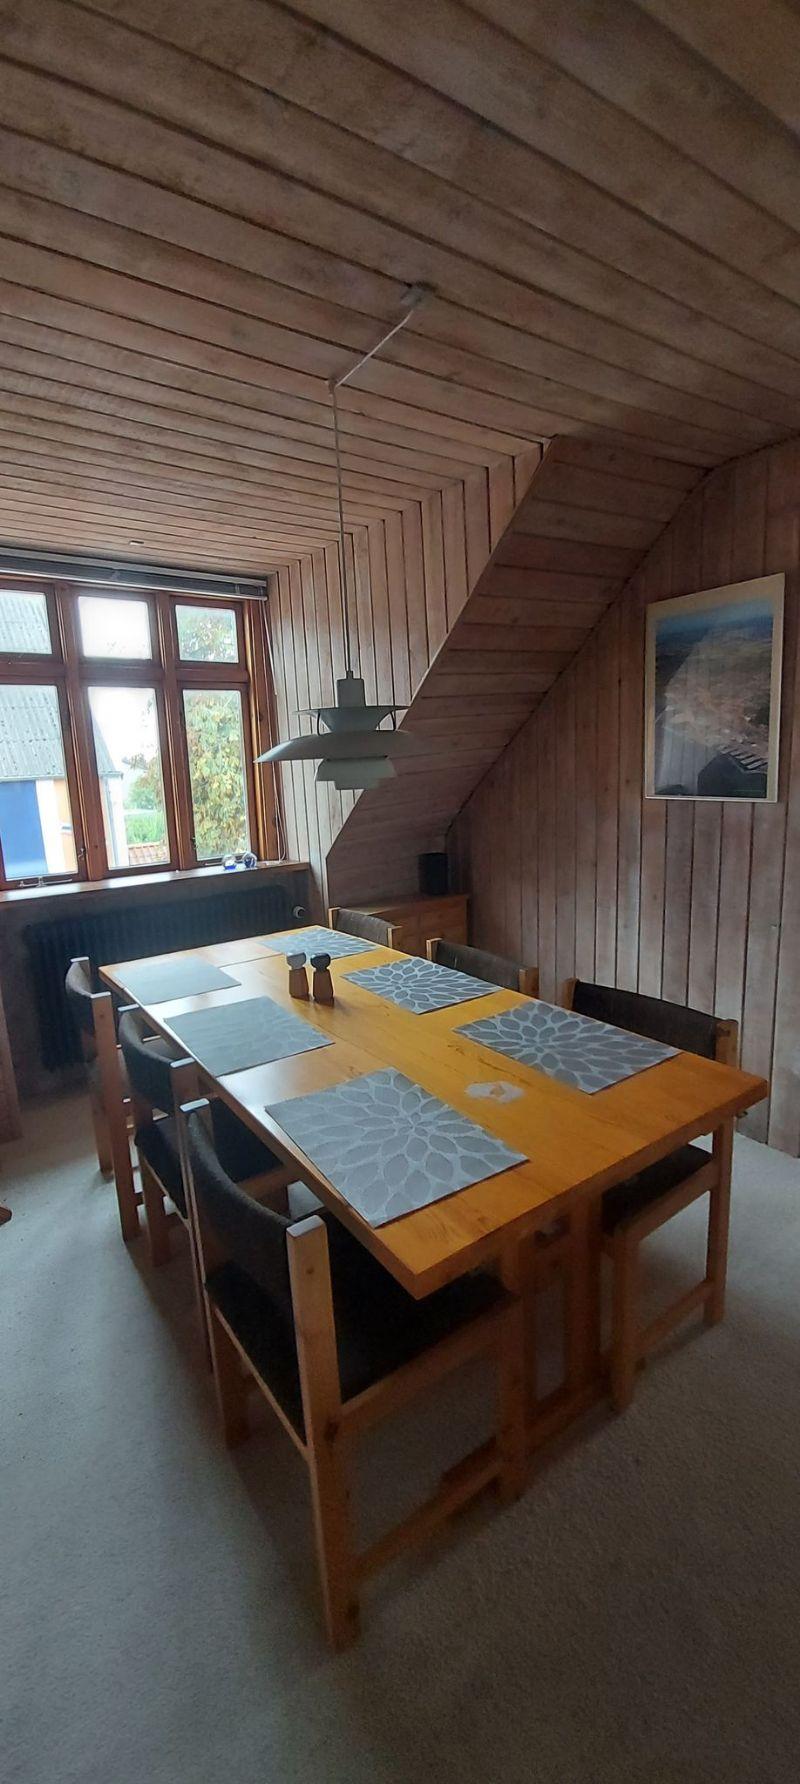 Ferienhaus 2643 - Hausfoto 7